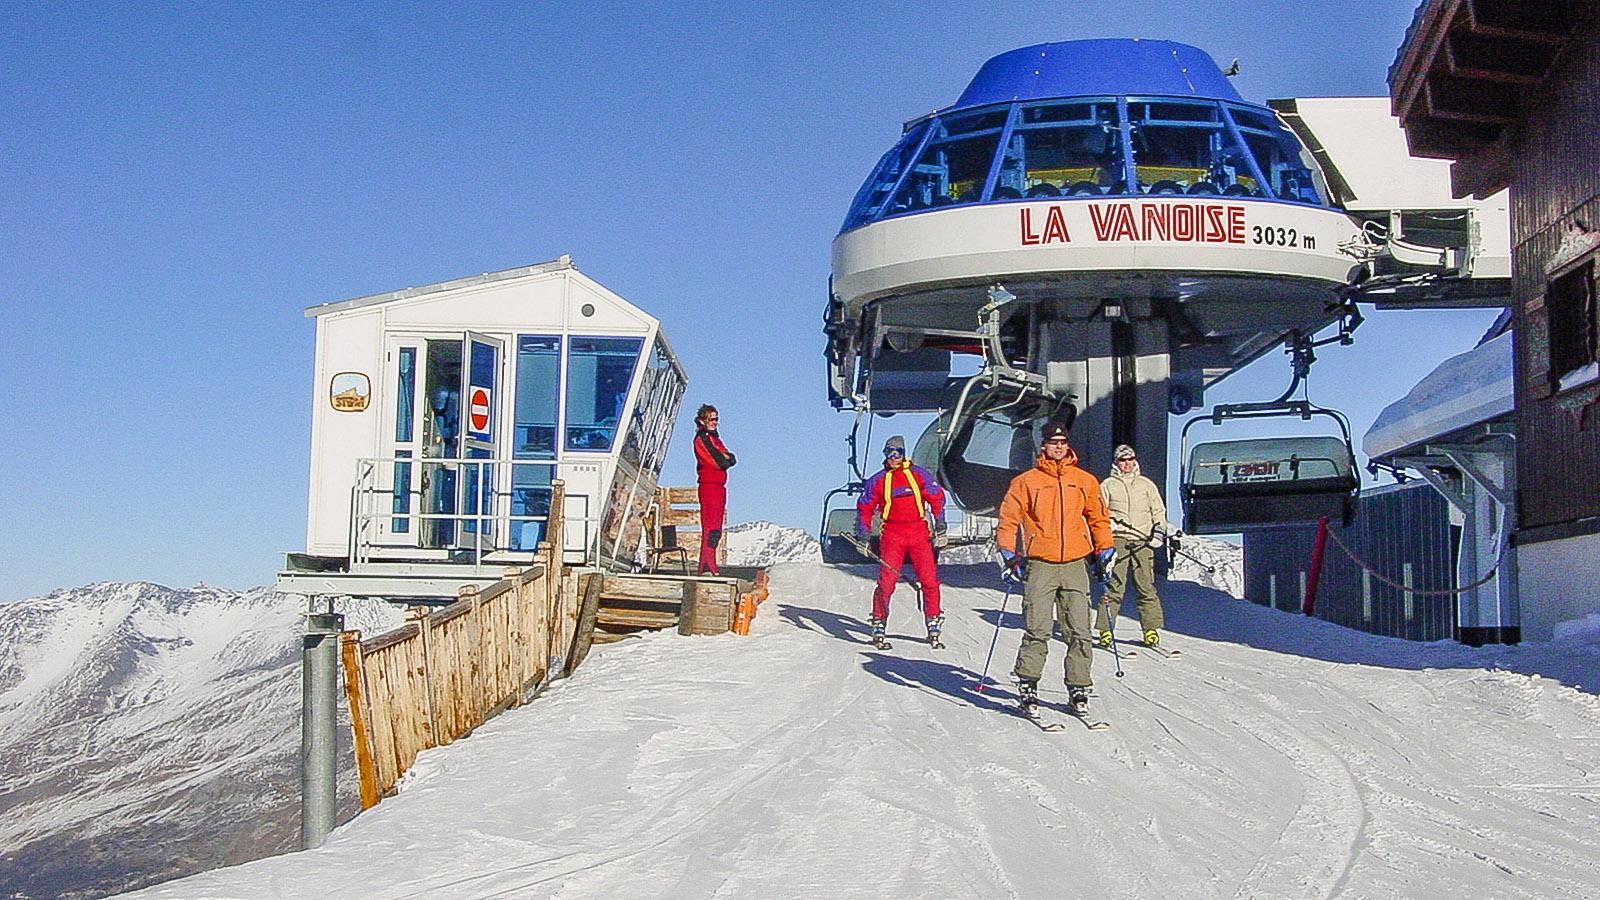 Skigebiet zu Füßen des Gletschers Grande Motte. Vanoise-Sessellift. Foto: Hilke Maunder